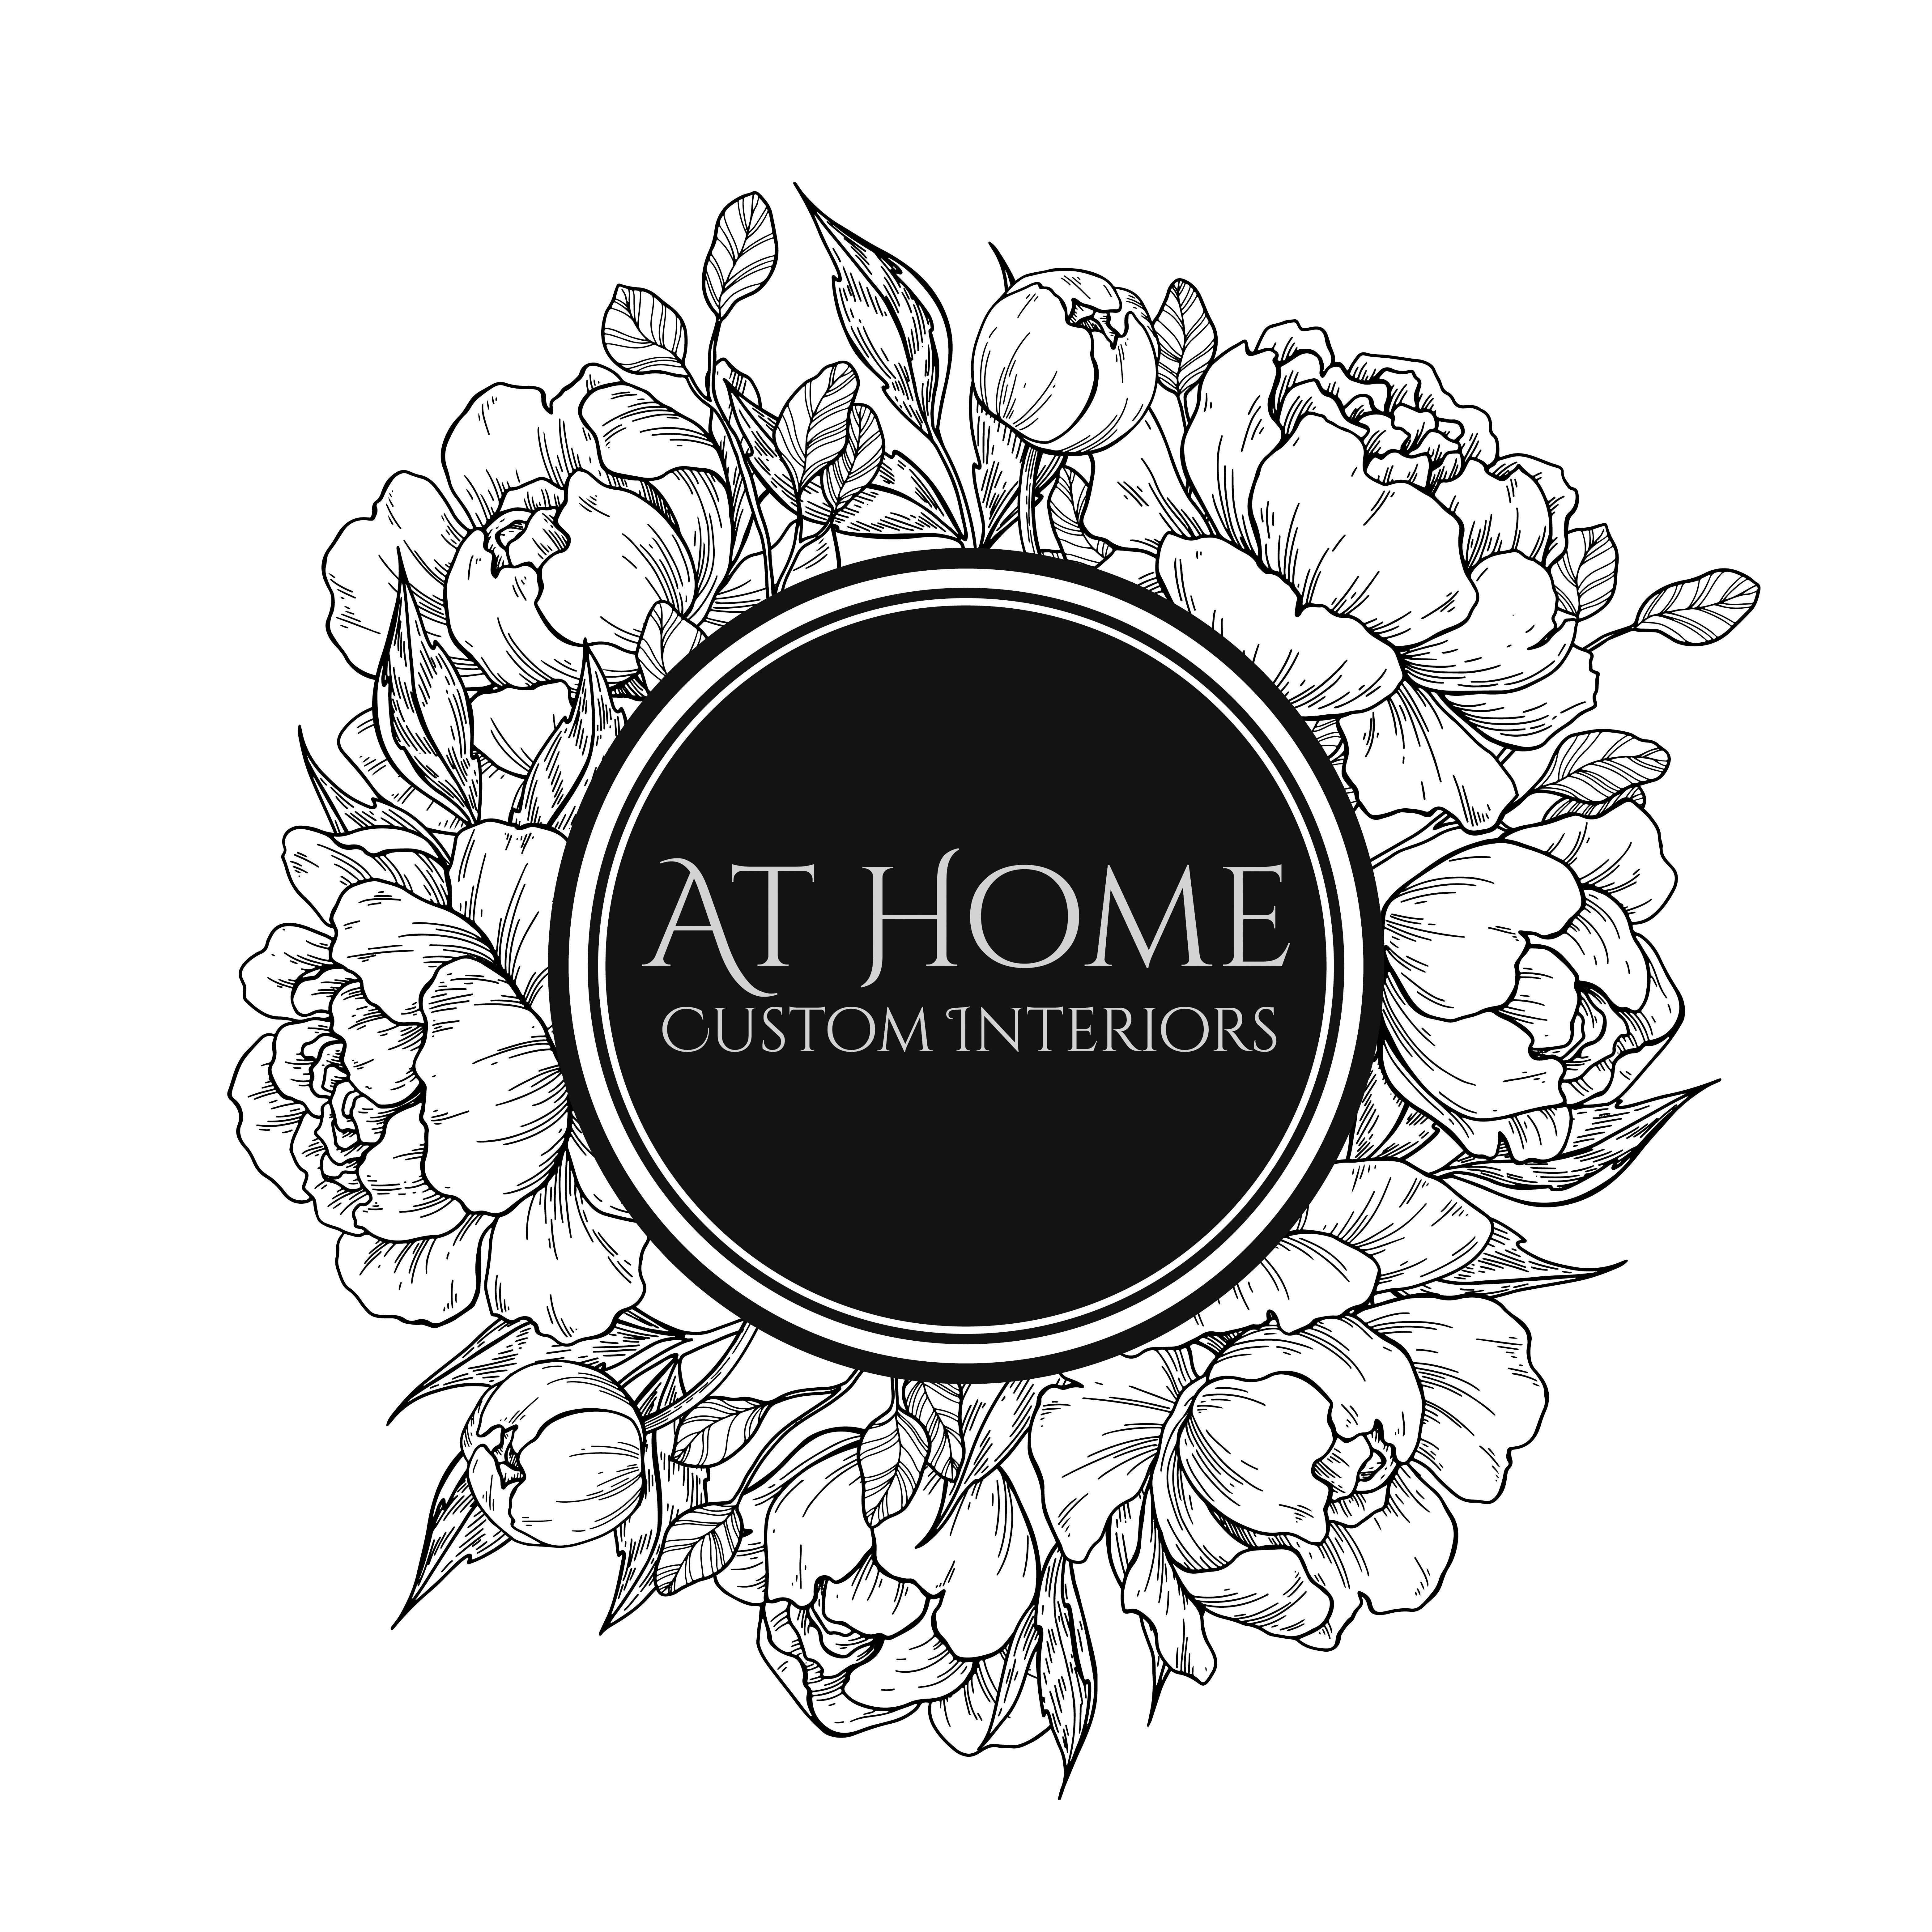 At Home Custom Interiors